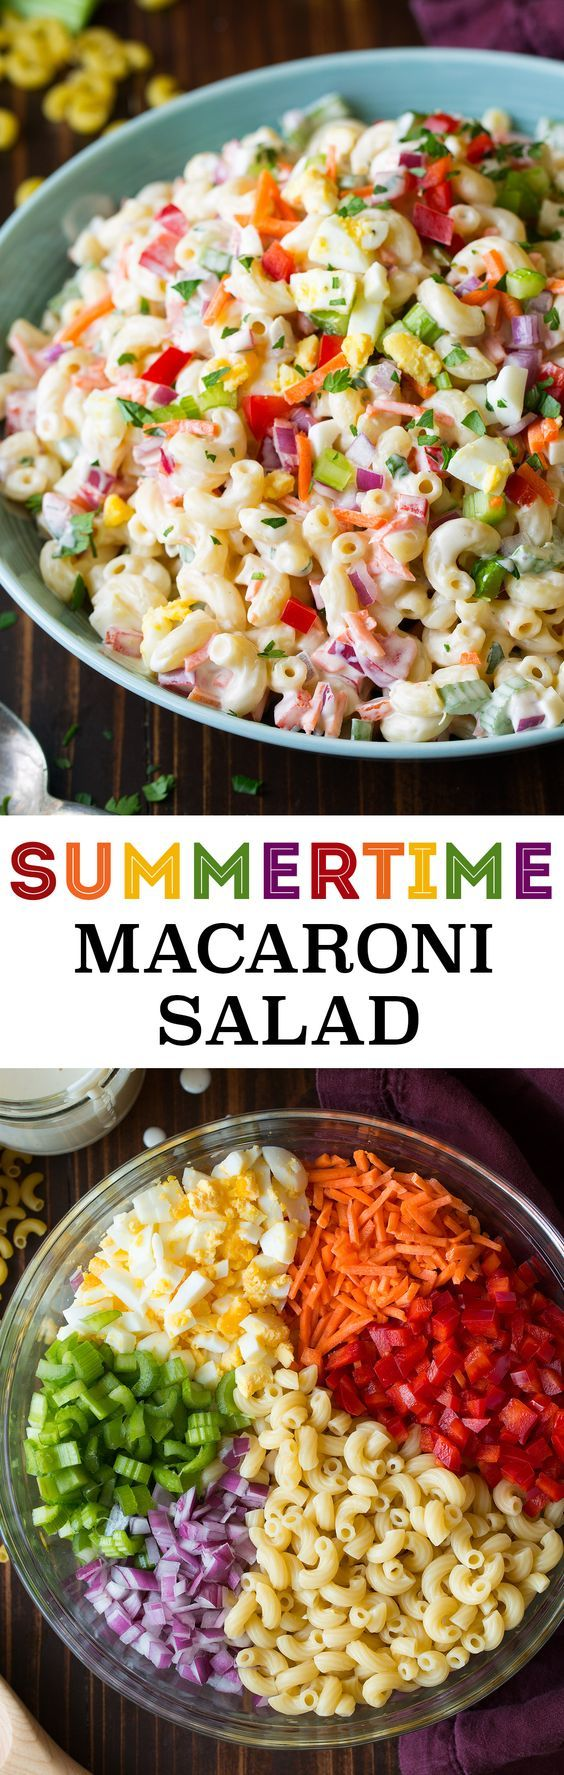 Classic Macaroni Salad | Pechenuhi